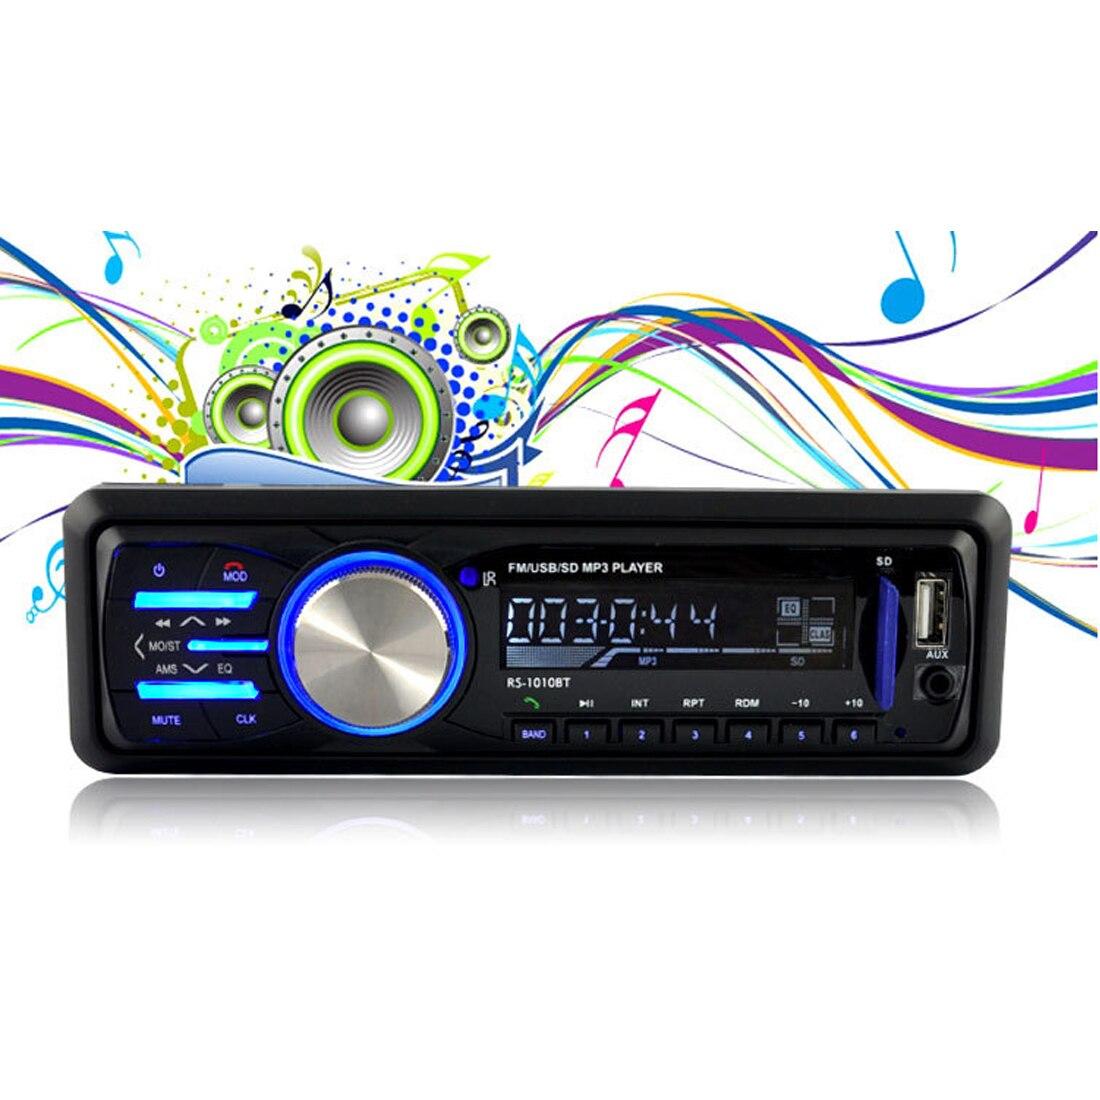 купить Marsnaska 12V Car Stereo FM Radio MP3 Audio Player Support Bluetooth Phone with USB/SD MMC Port Car Electronics In-Dash 1 DIN по цене 1800.57 рублей